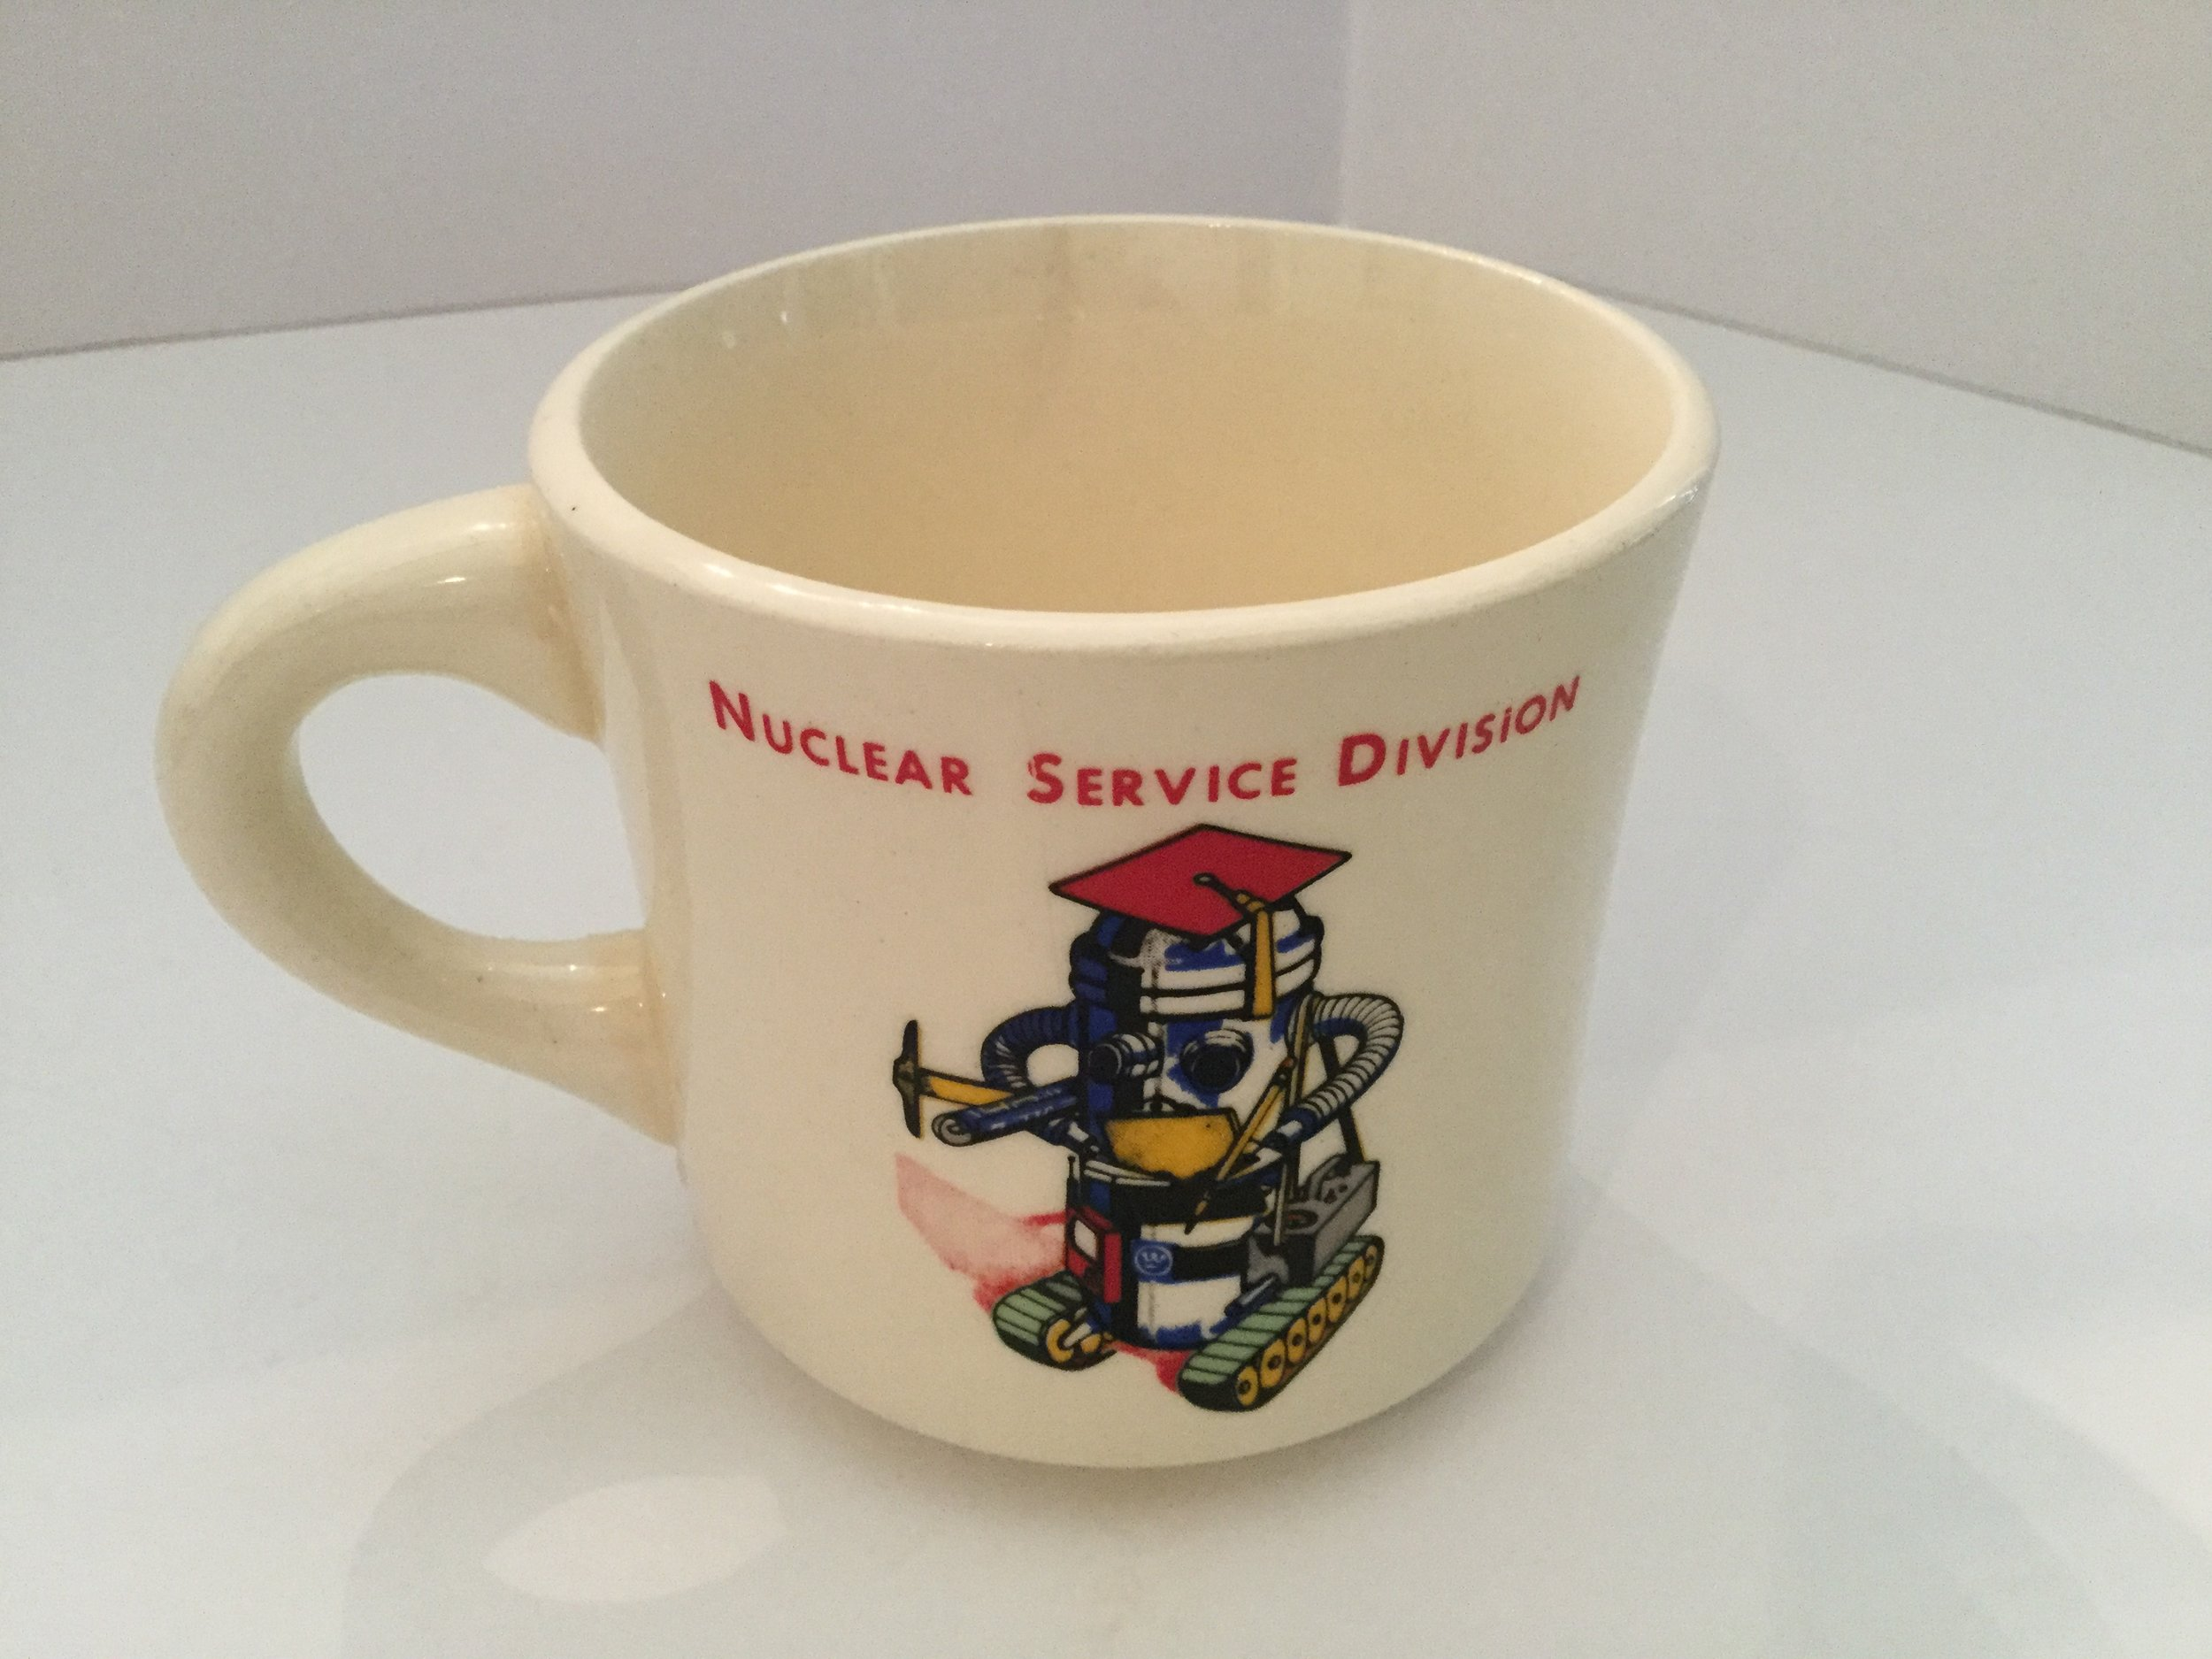 Reverse side of Dad's mug